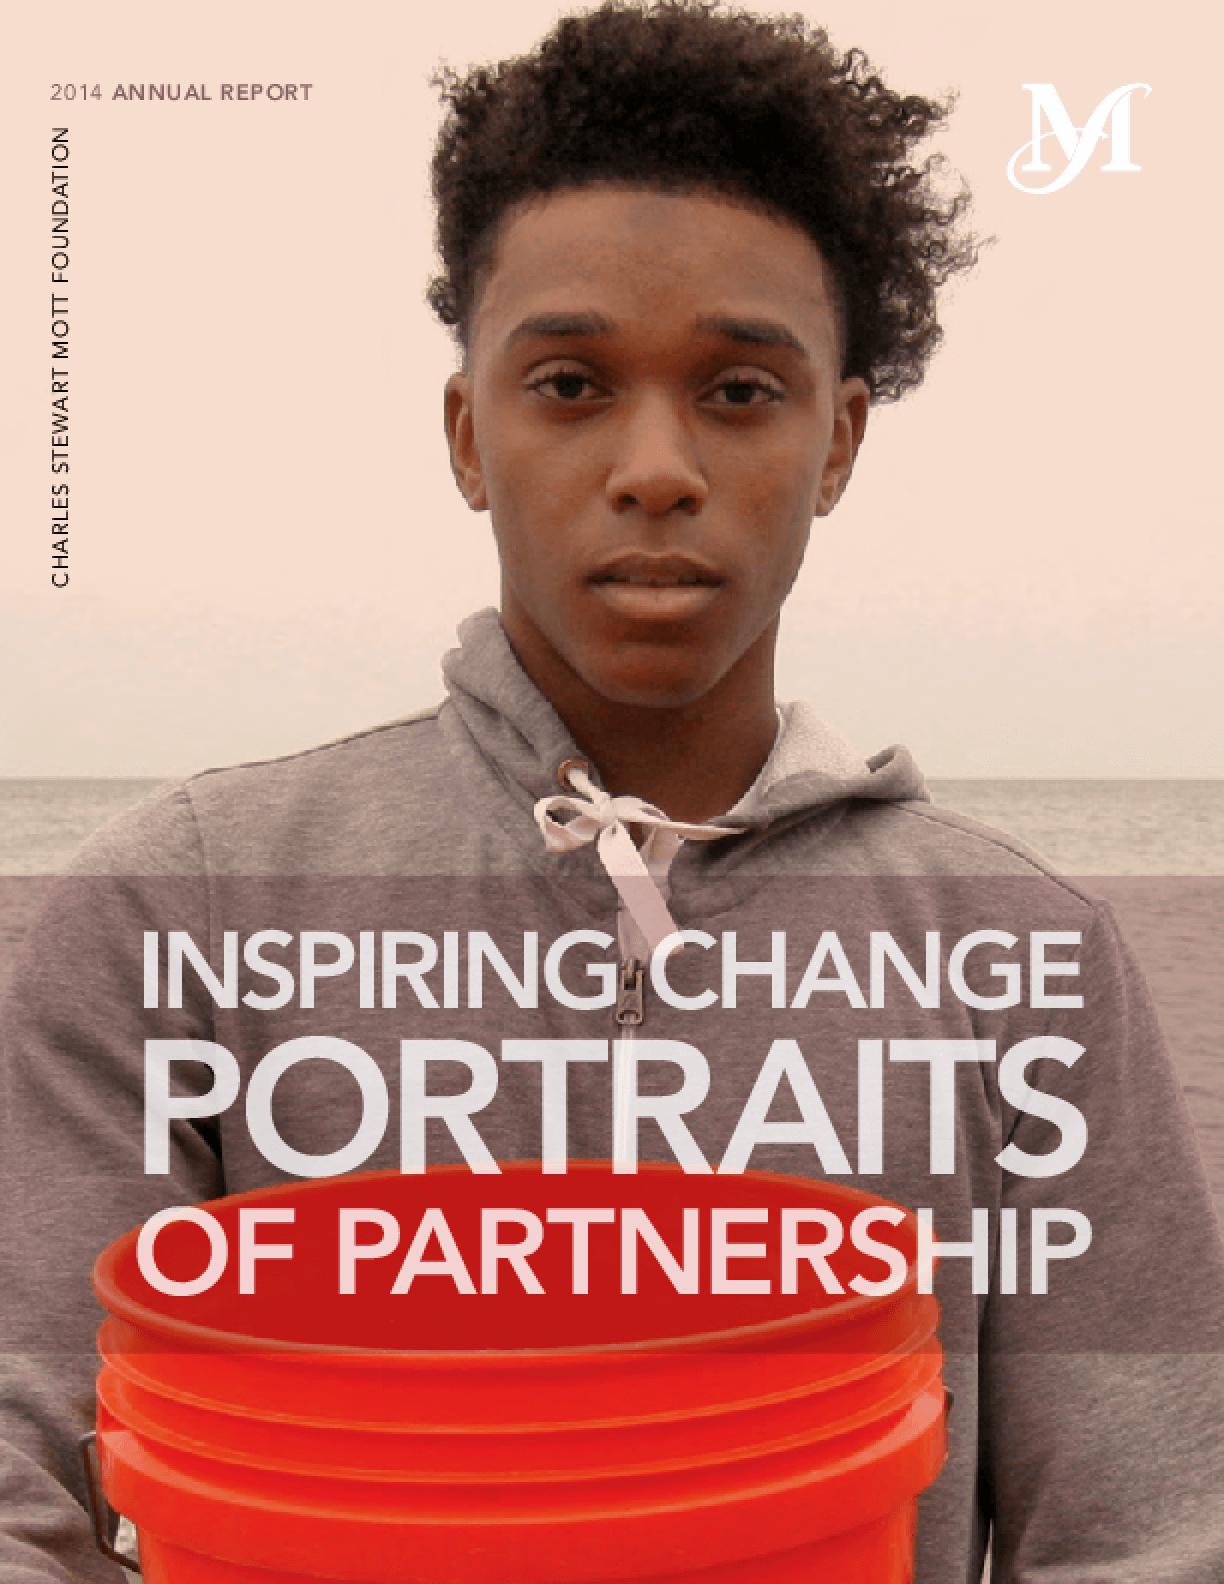 Inspiring Change: Portraits of Partnership